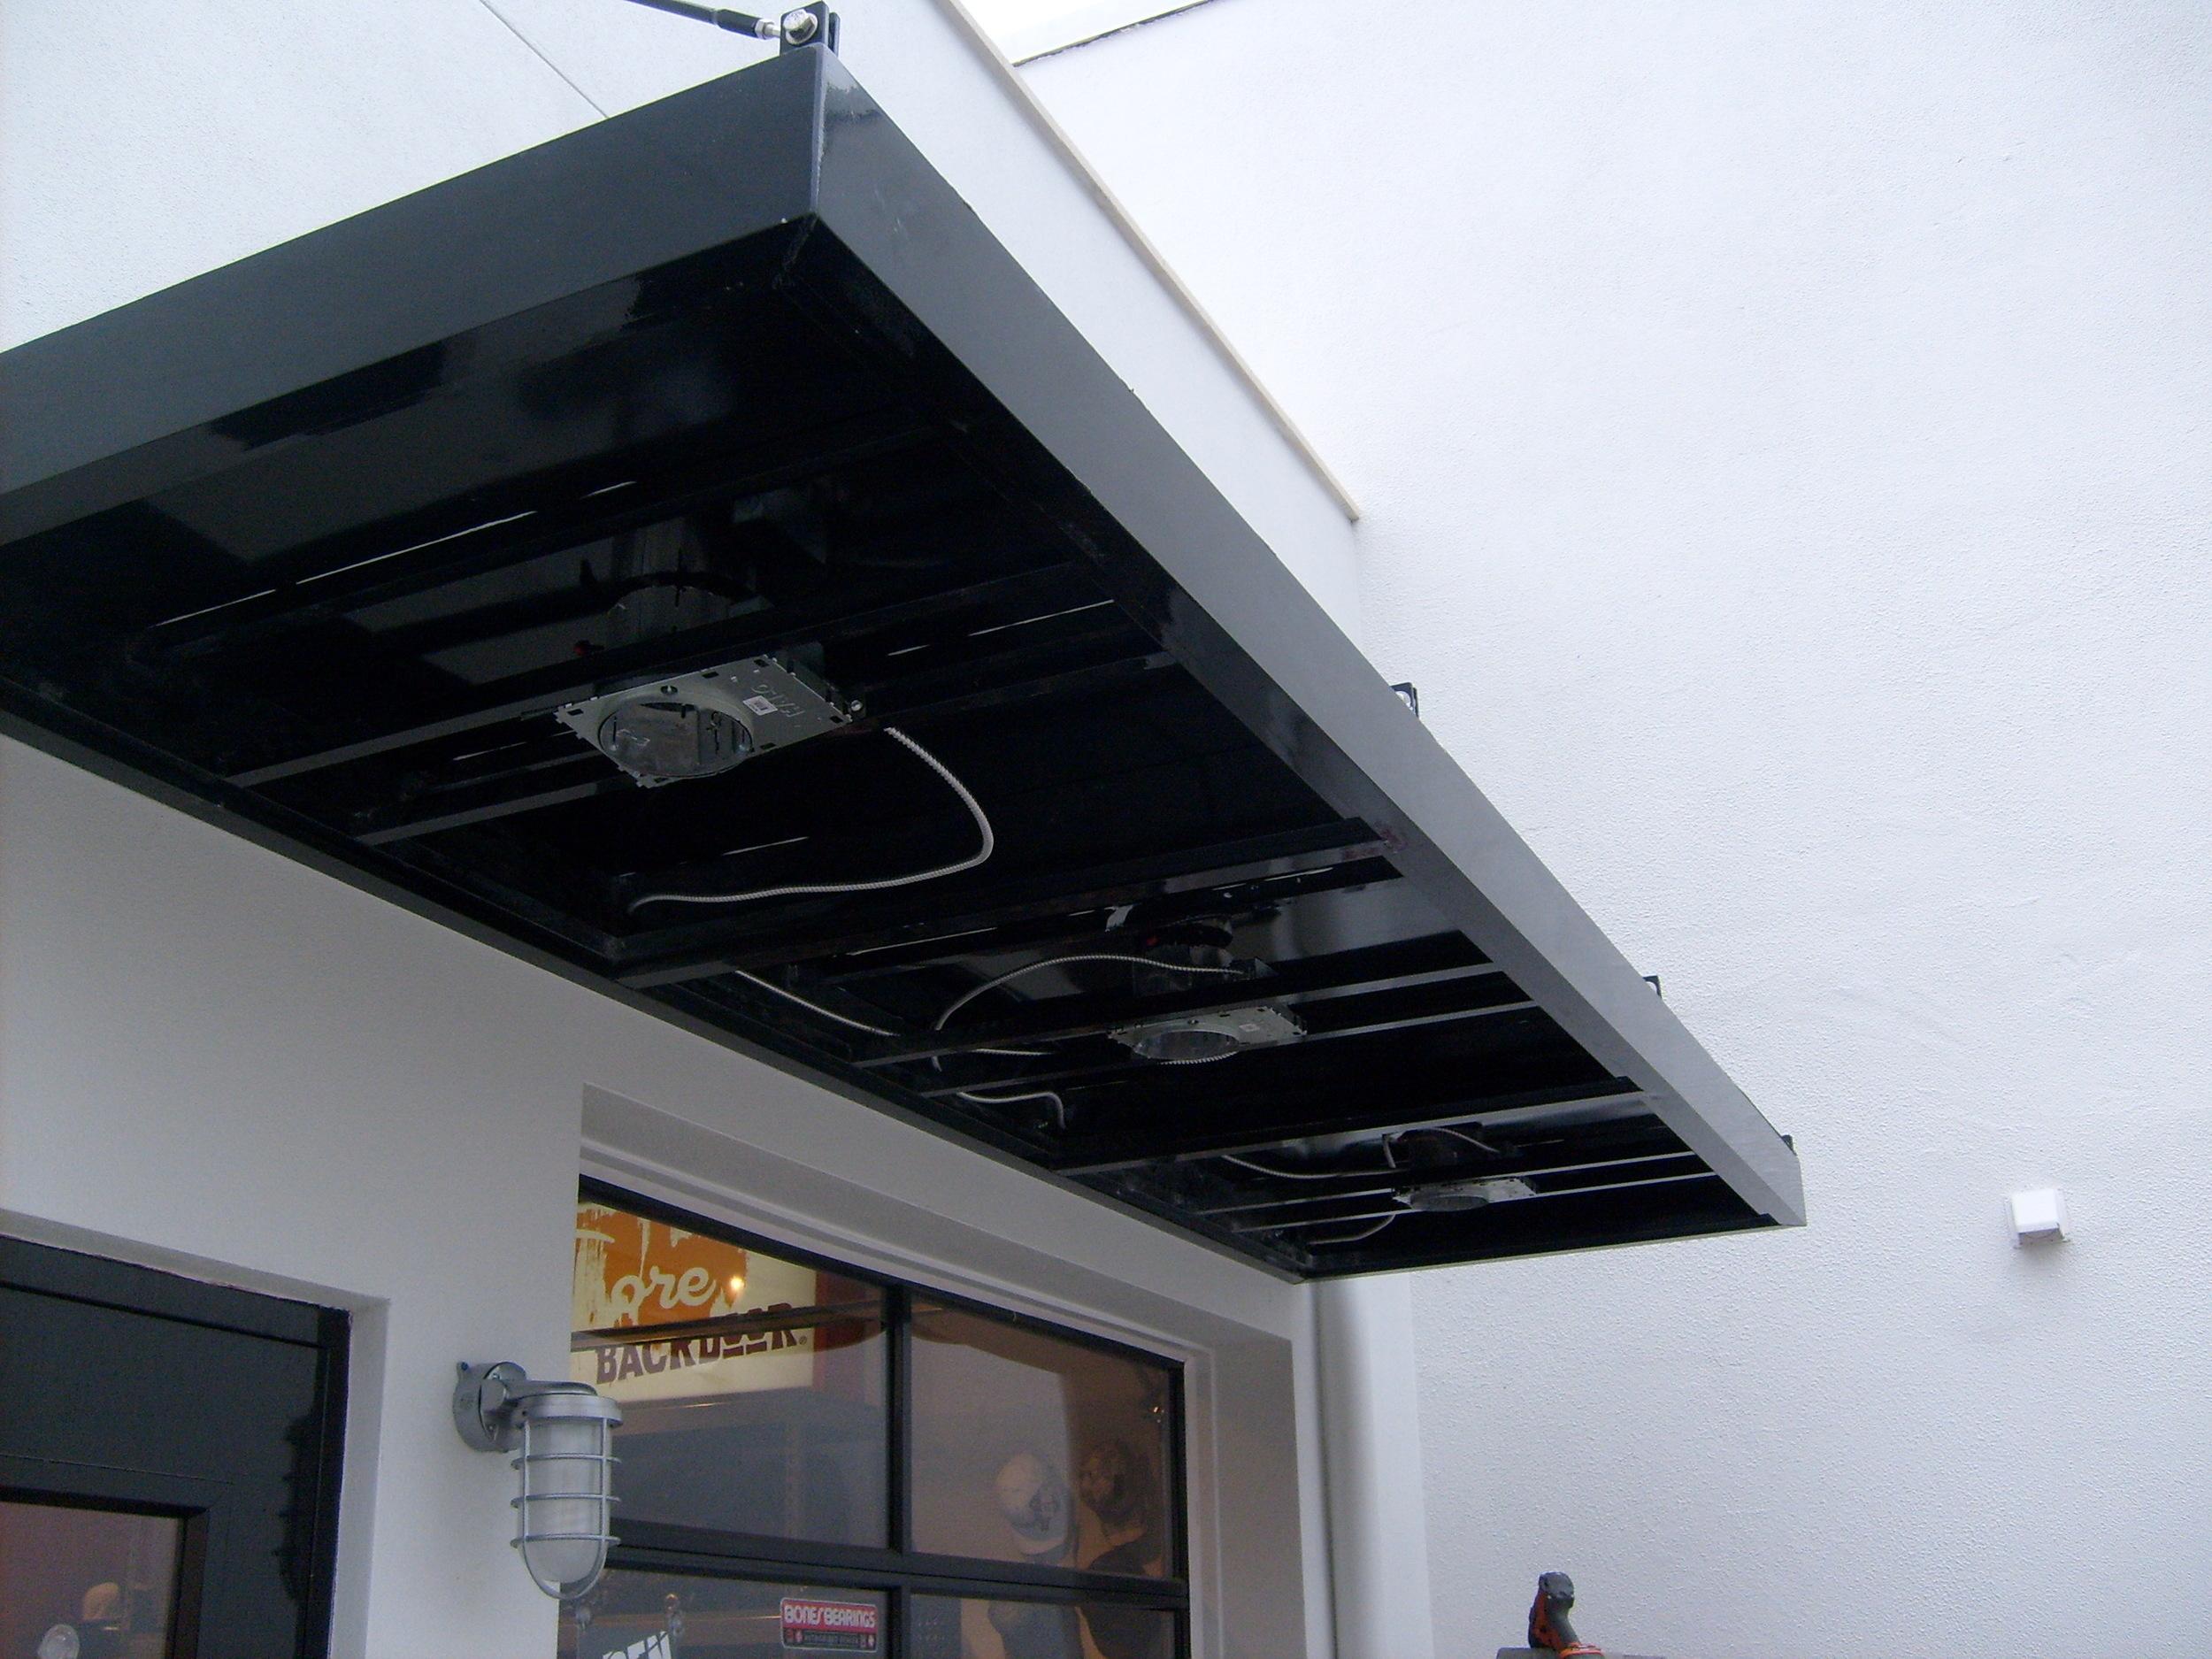 297 Lights Installed on the Underside